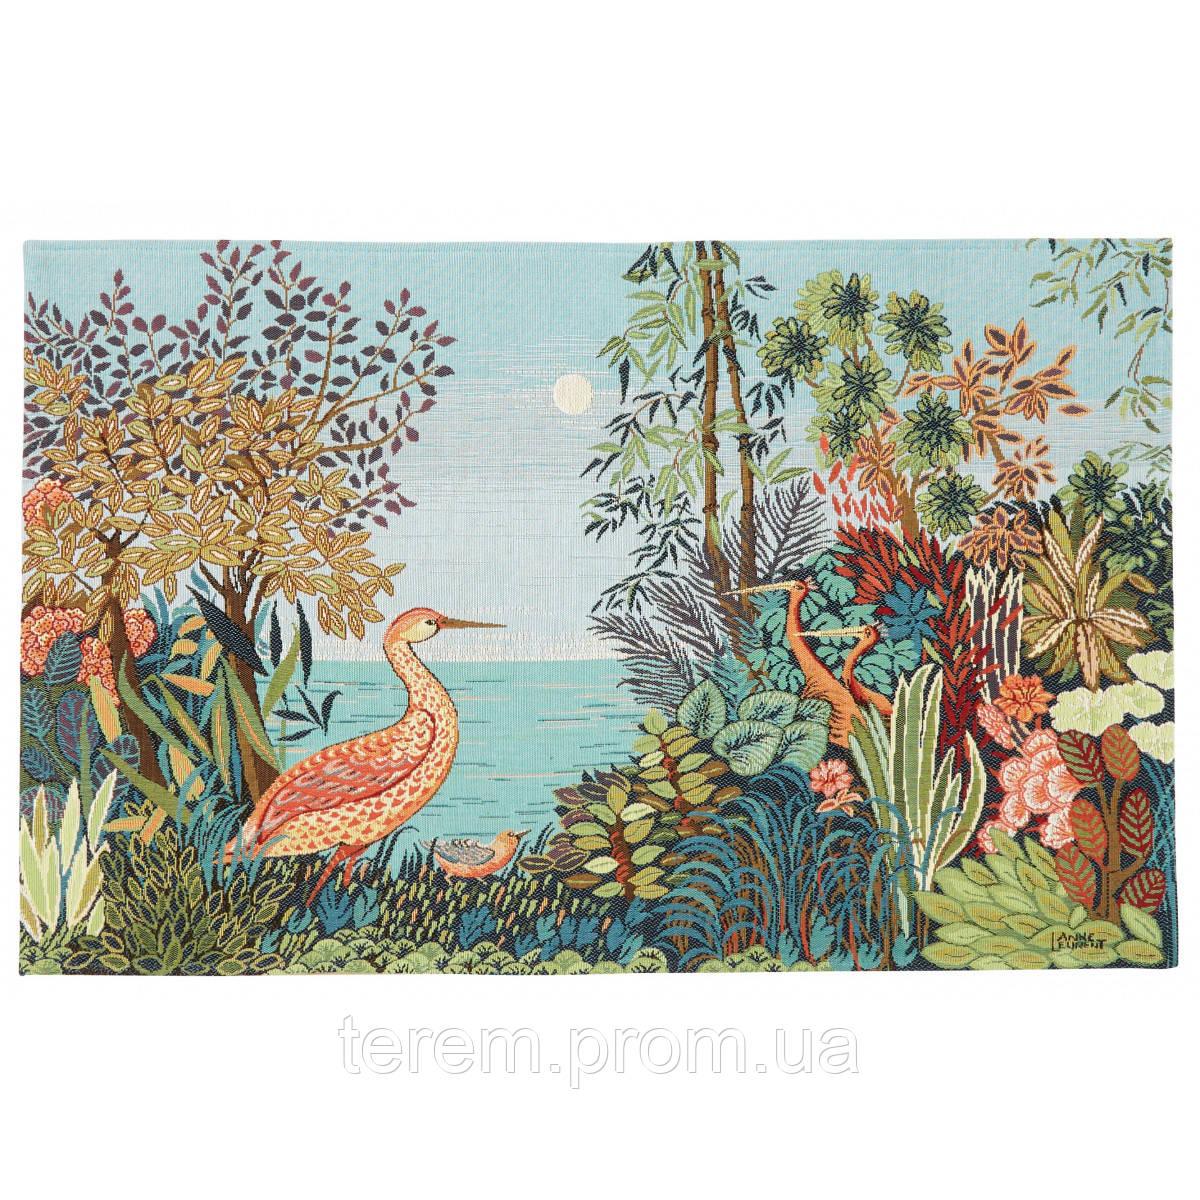 Гобеленова картина Art de lys The Heron in the Nature, Anne Leurent 50x75 5849X без підкладки